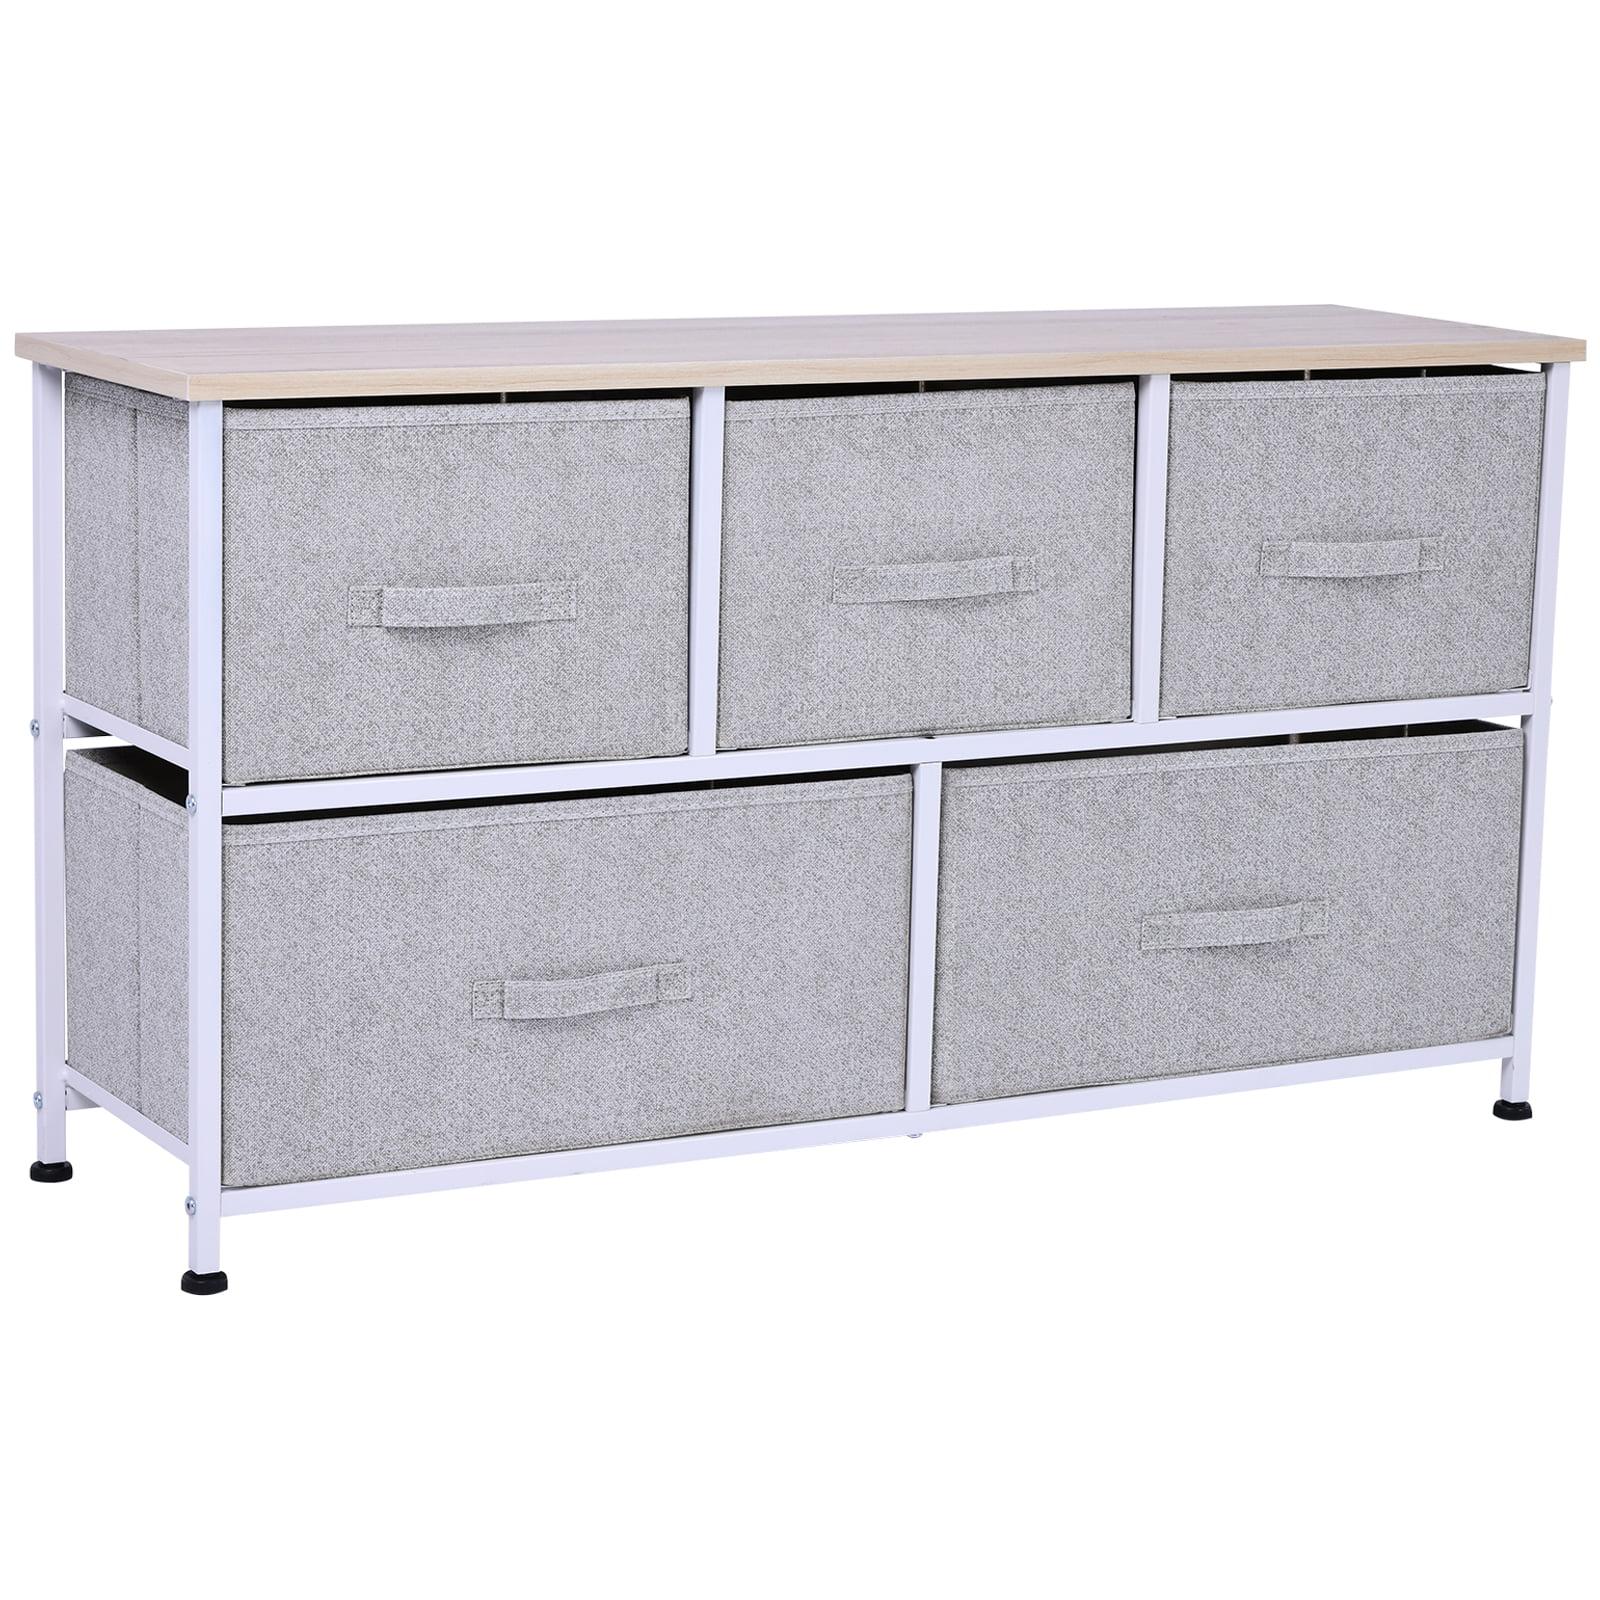 "HOMCOM 40"" L 5 Drawer Horizontal Storage Cube Dresser Unit Bedroom Organizer Livingroom Shelf Tower With Fabric Bins - Walmart.com - Walmart.com"